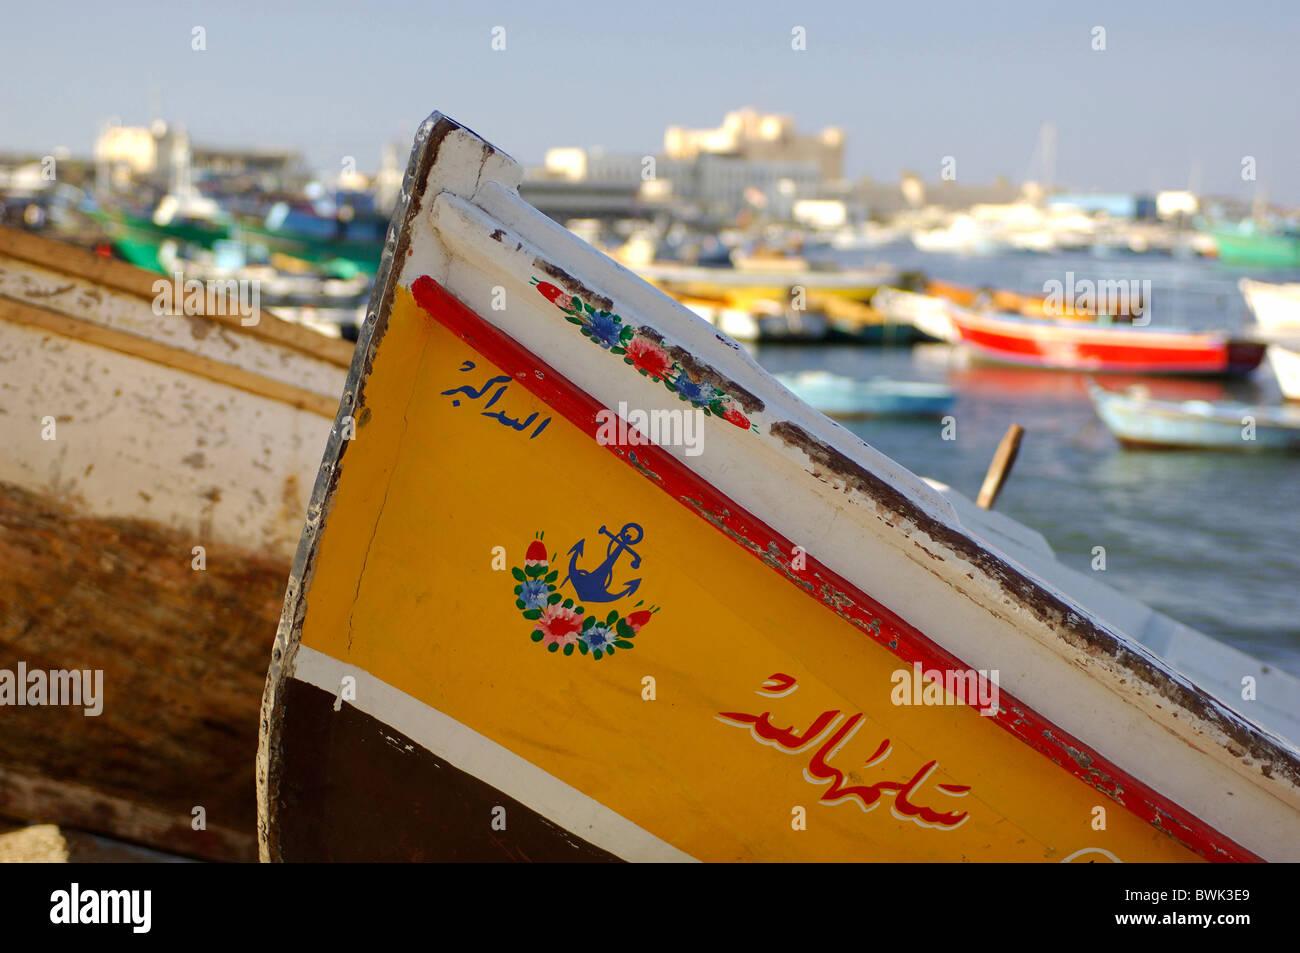 boat detail inscription lettering fishing boat harbour port Qaitbey Harbour Alexandria Egypt North Africa - Stock Image